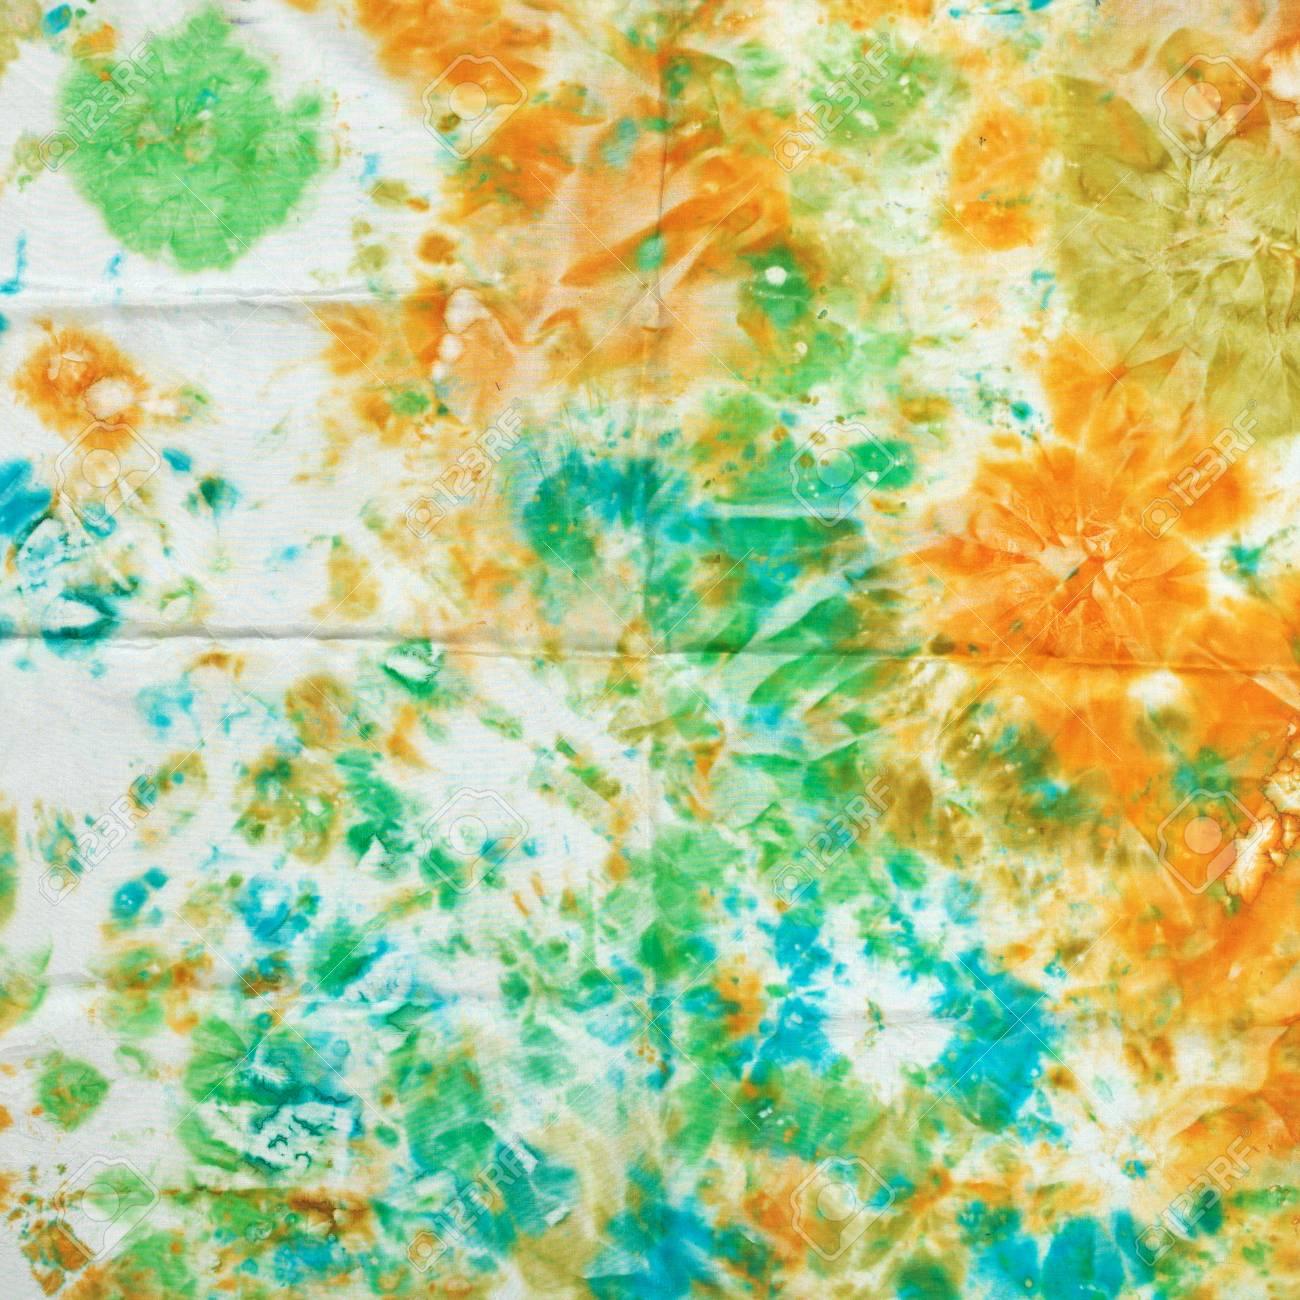 abstract nodular green and orange pattern of painted silk batik on handmade scarf Stock Photo - 25046992